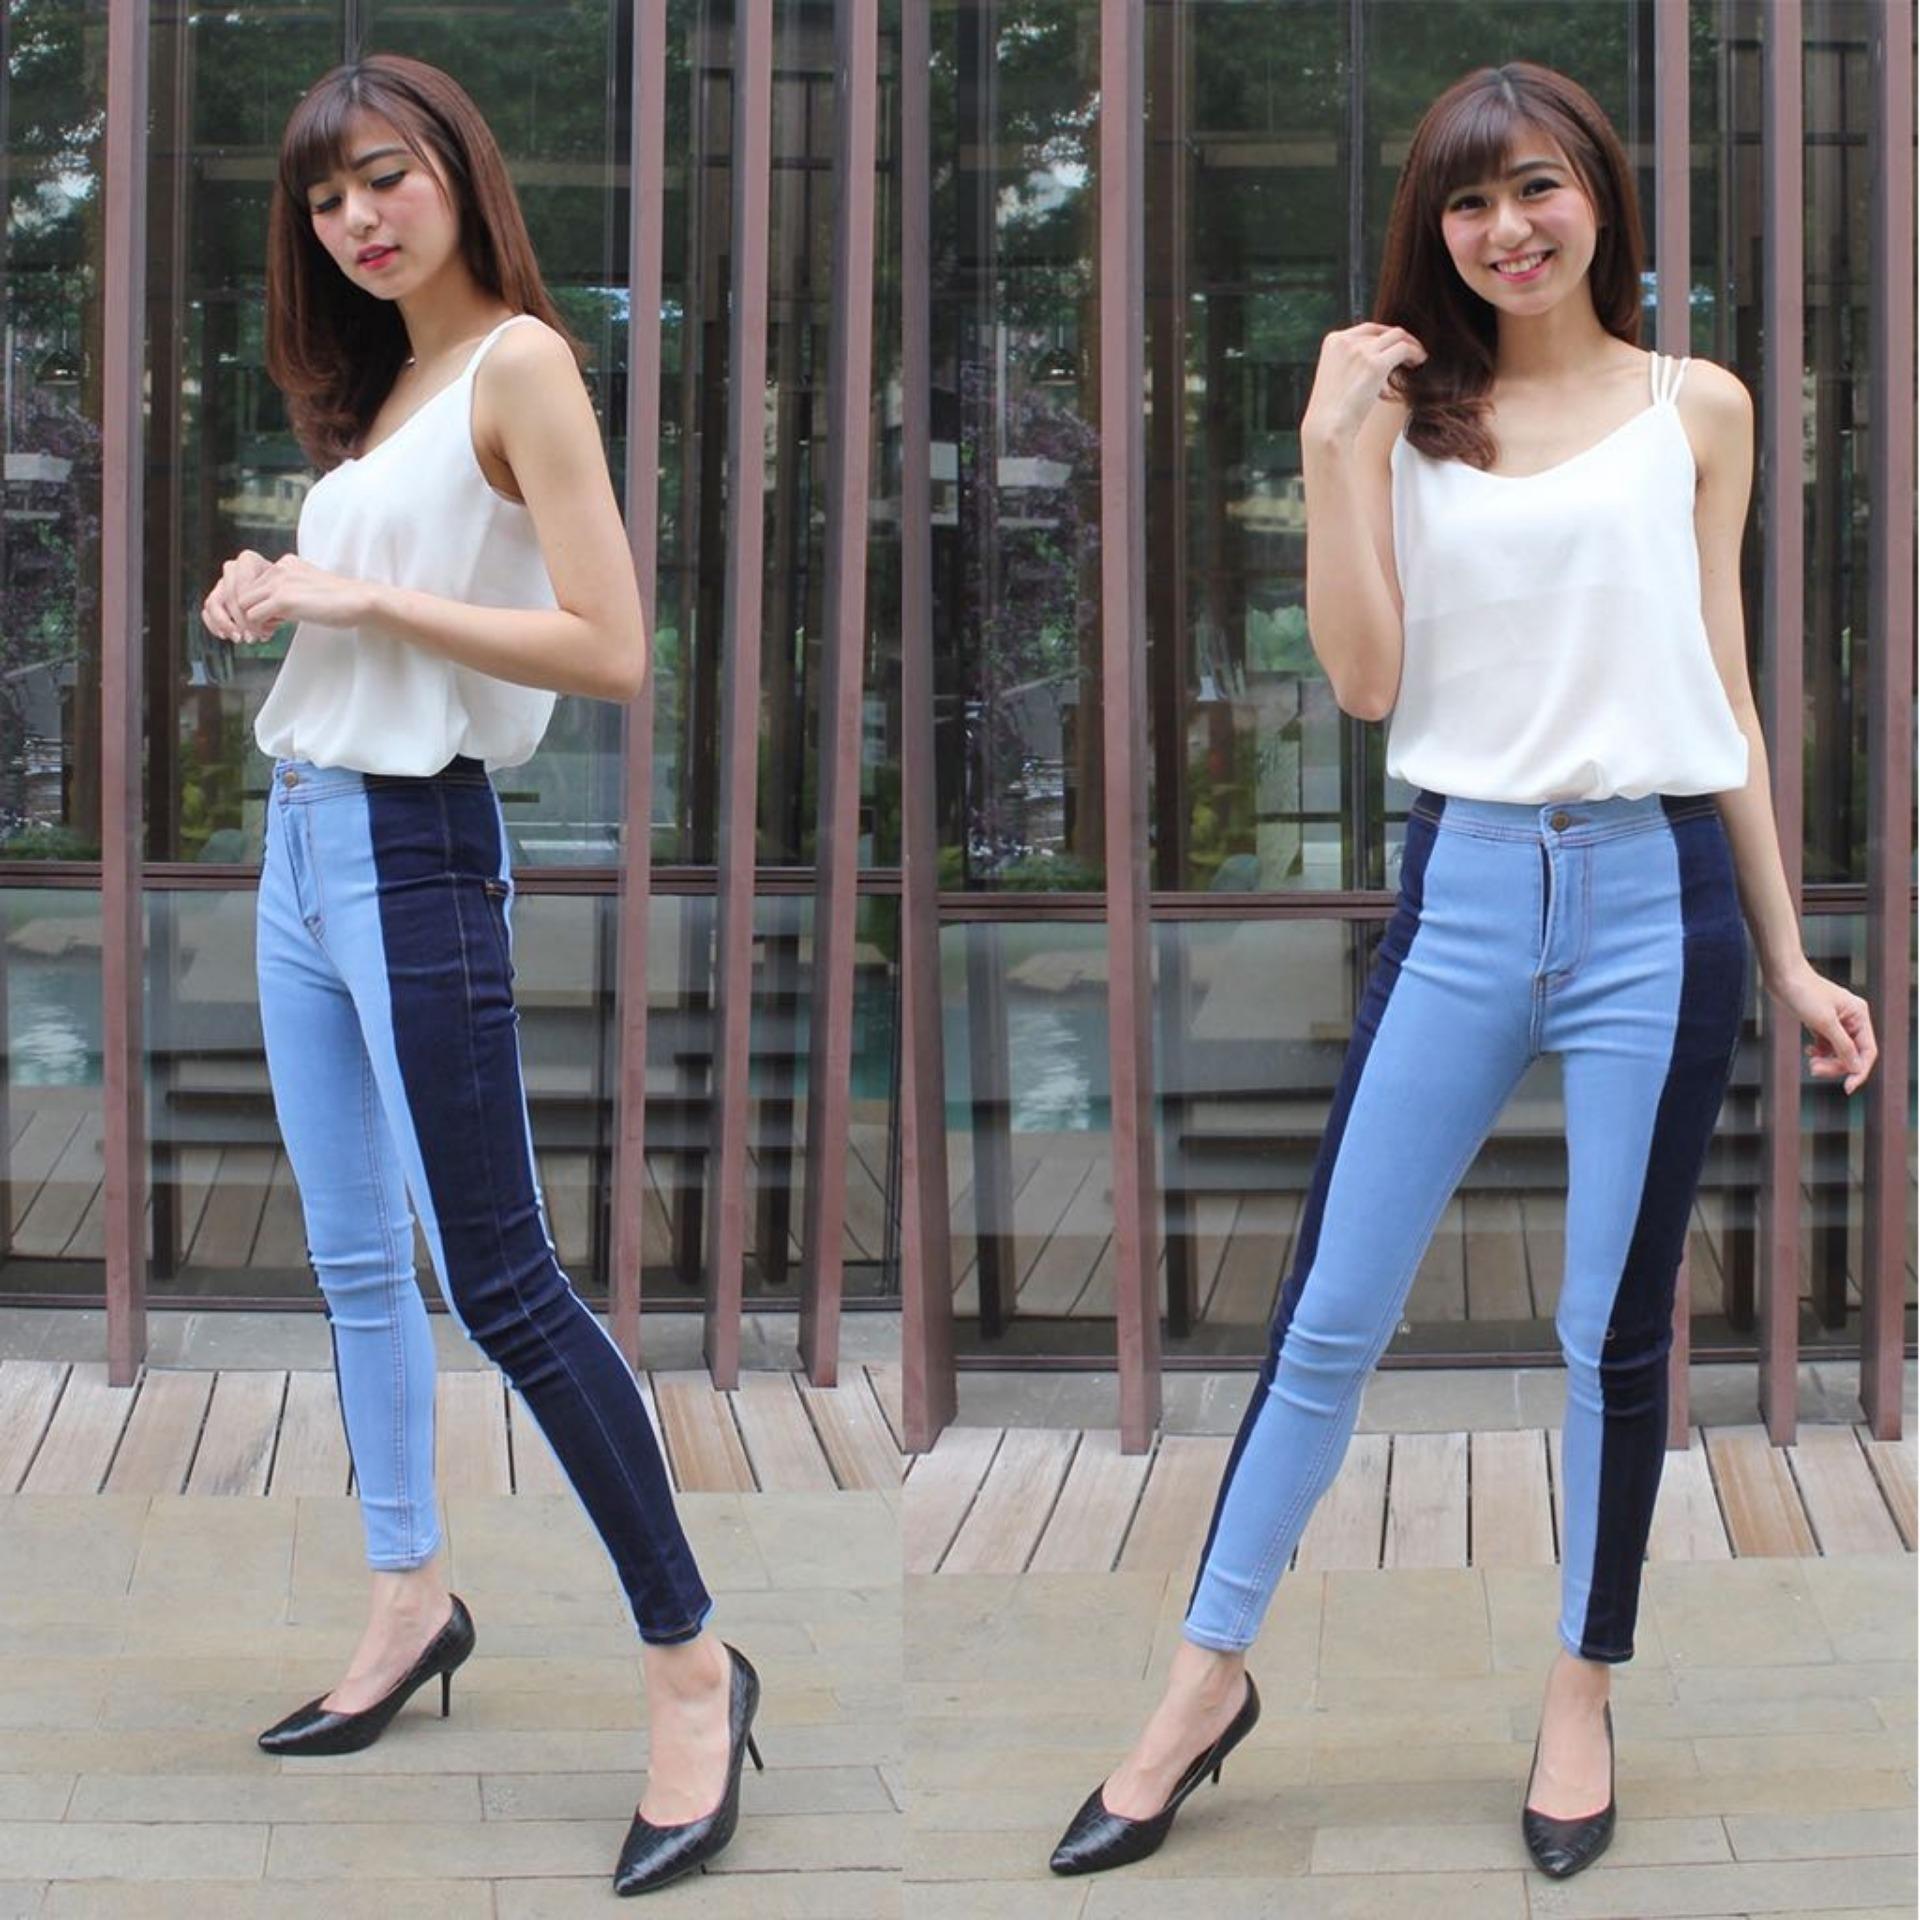 Vrichel Collection Celana Jeans / Celana Panjang Highwaist Skinny Jeans Pinny HW LIST Premium